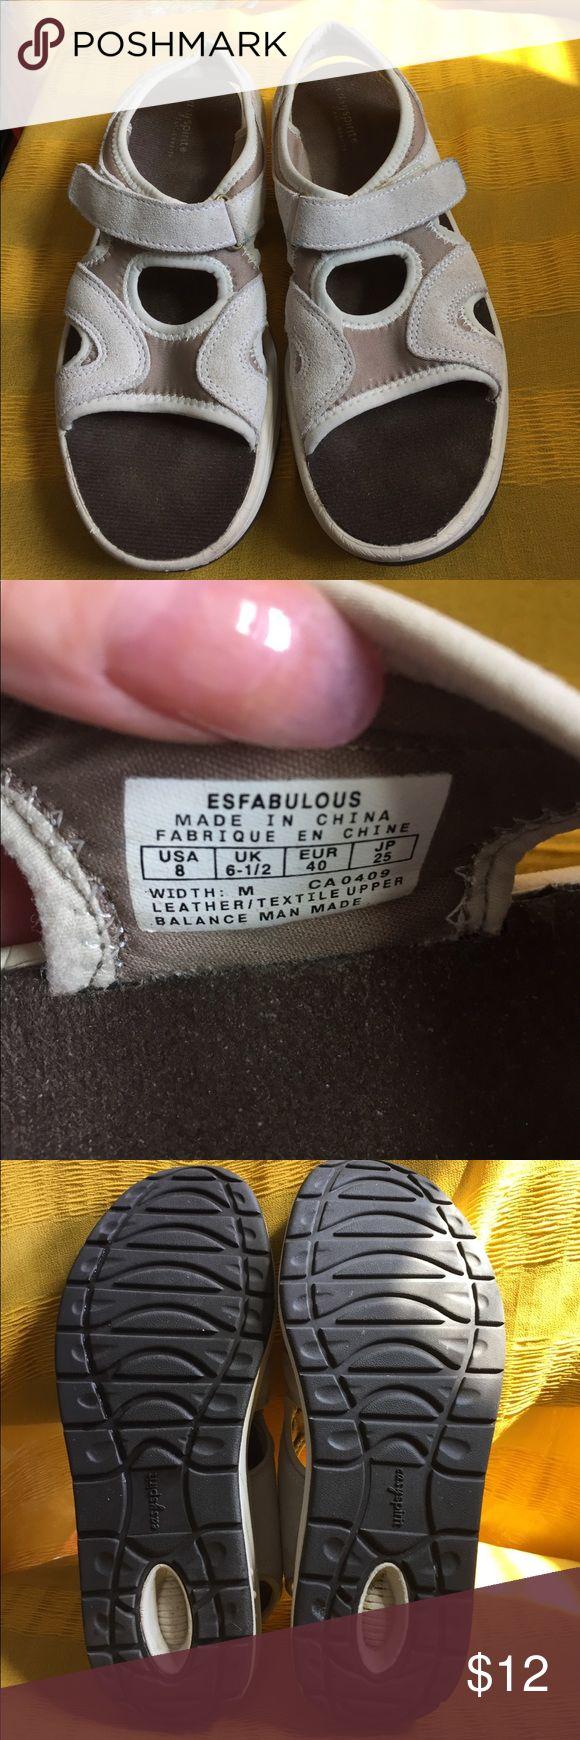 Easy Spirit sandals Great walking sandals! Velcro fastener , anti gravity, tan suede Easyspirit Shoes Sandals